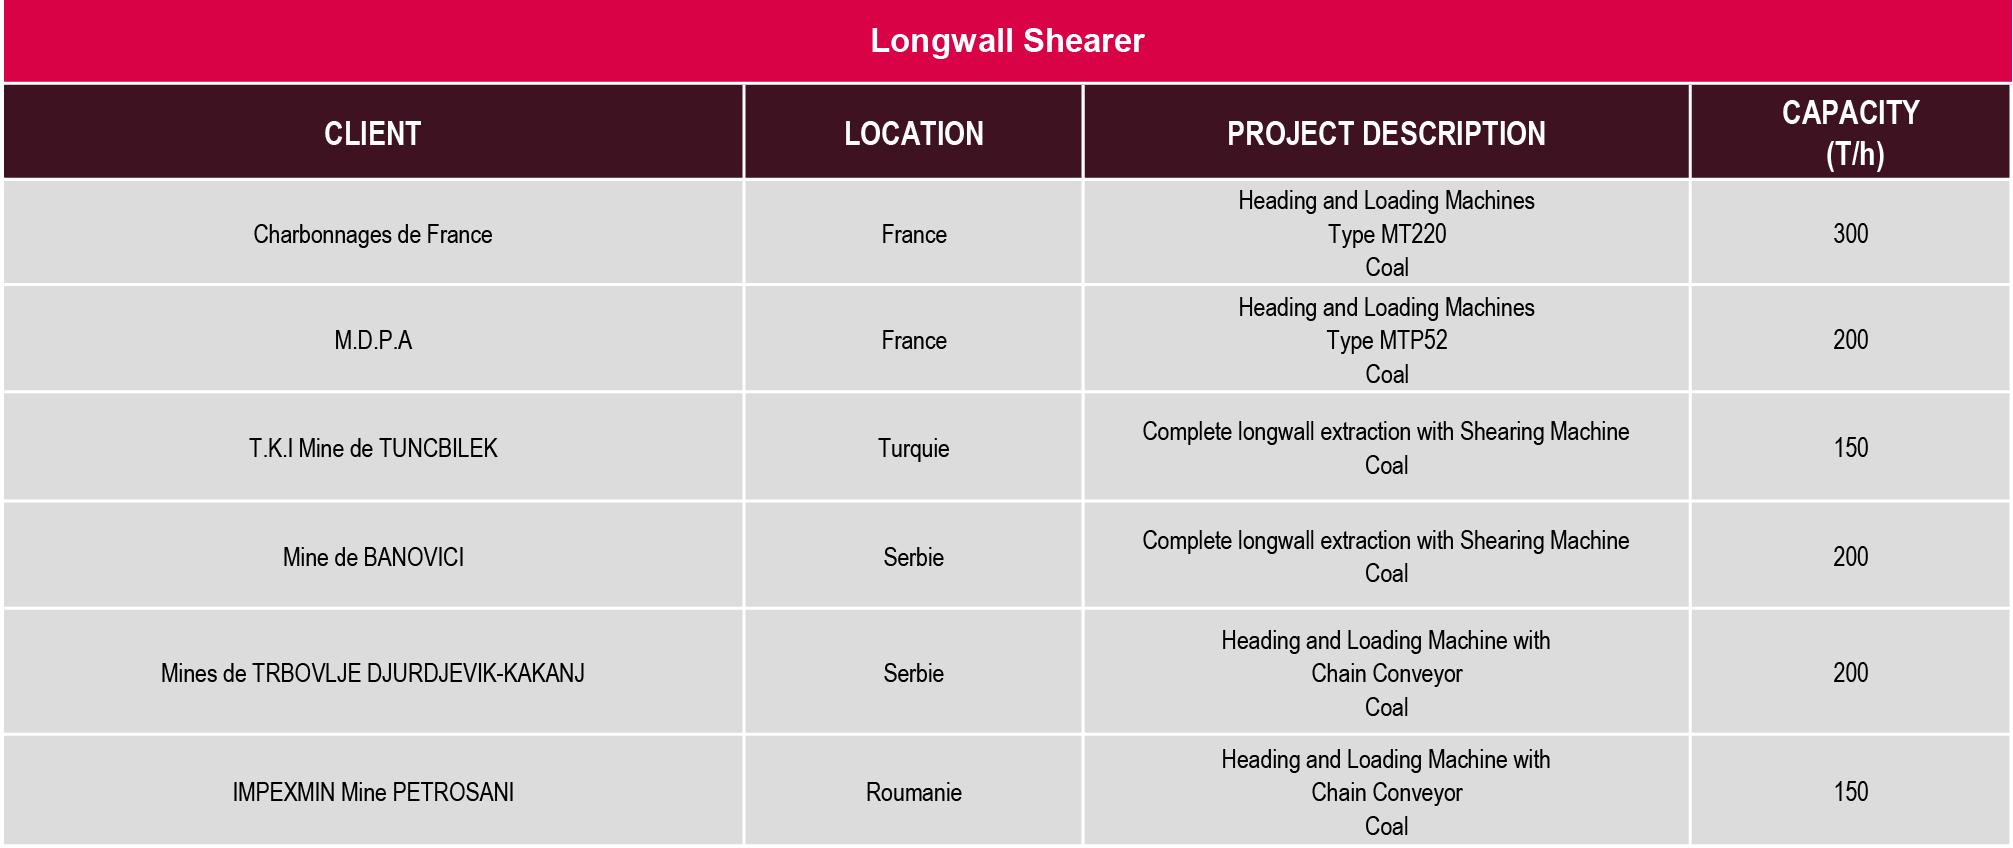 LONGWALL SHEARER - LA STEPHANOISE